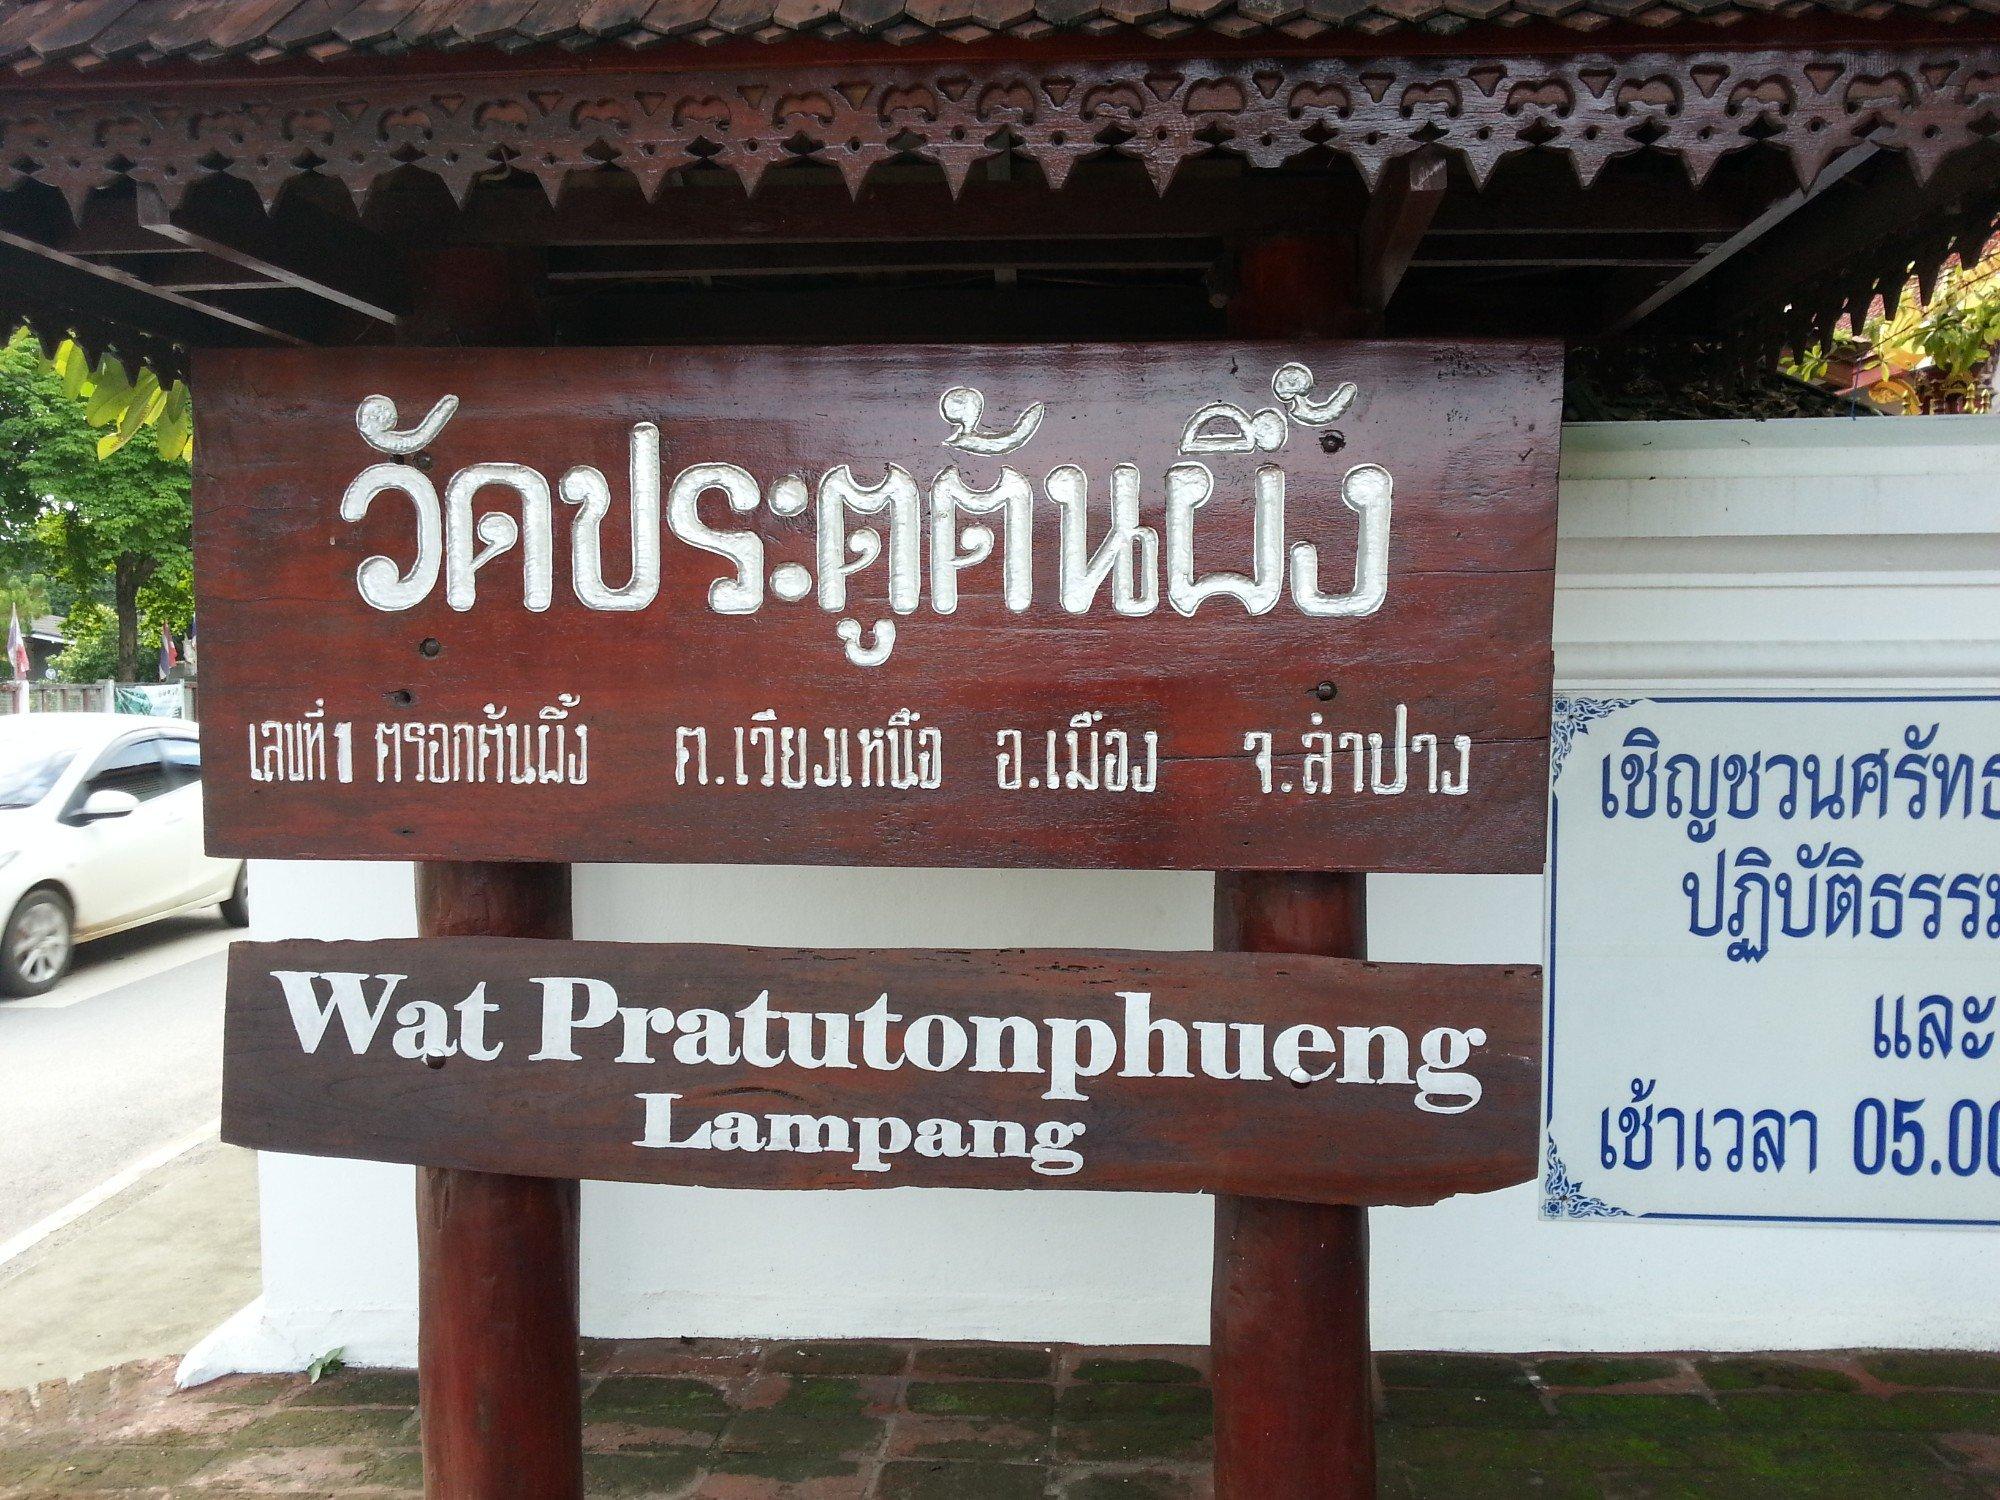 Wat Pratu Ton Phueng in Lampang